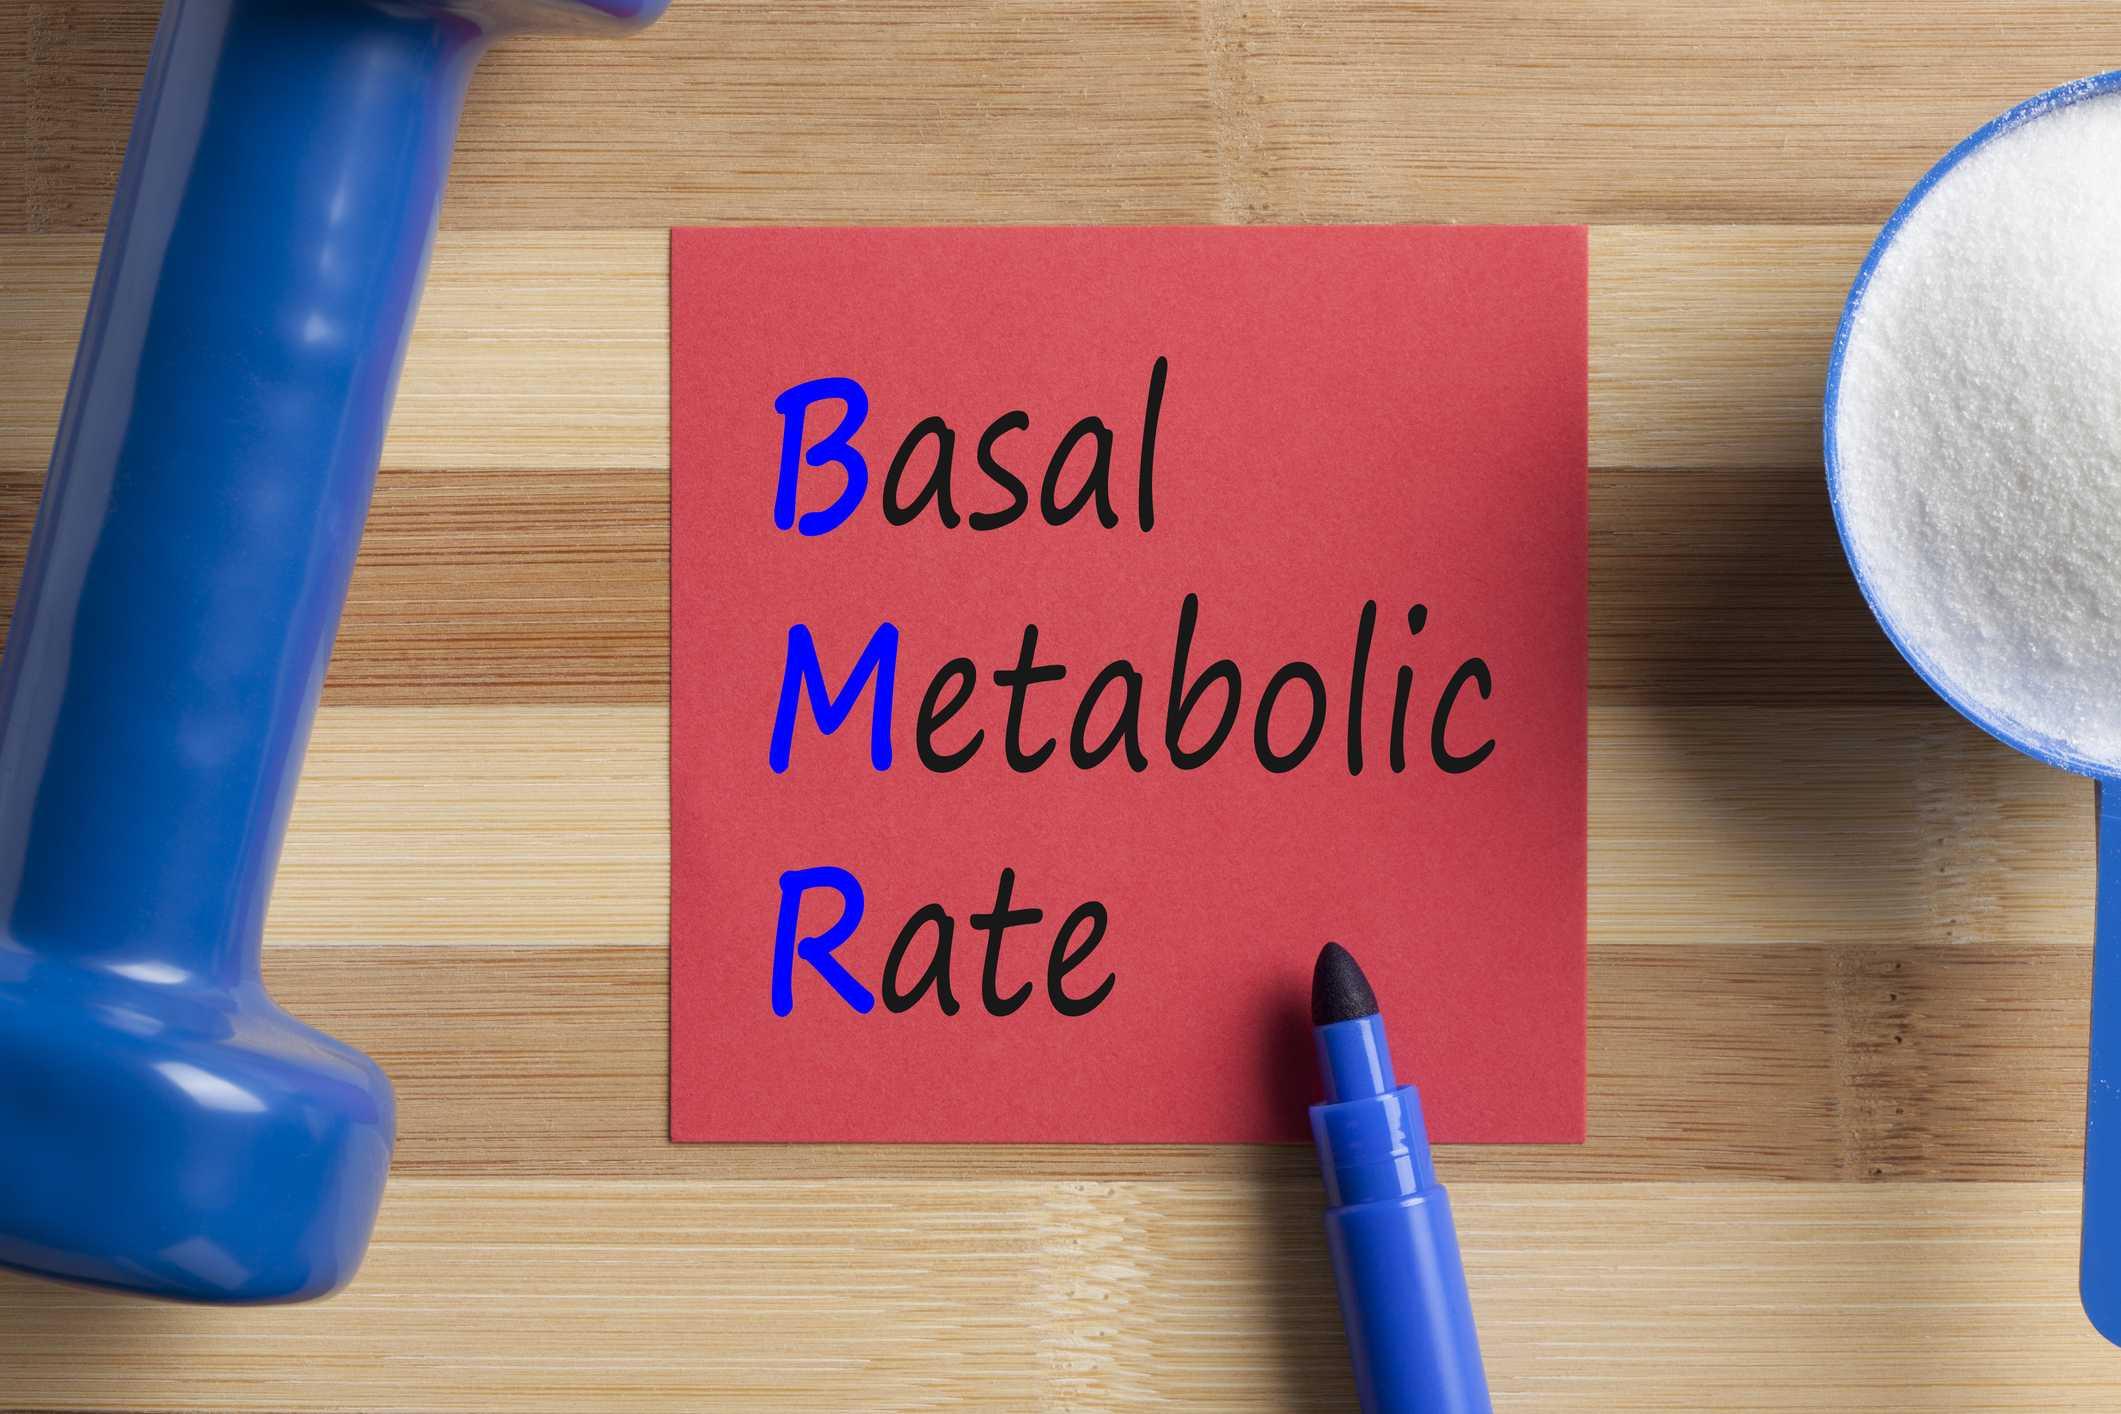 Basal Metabolic Rate Calculator